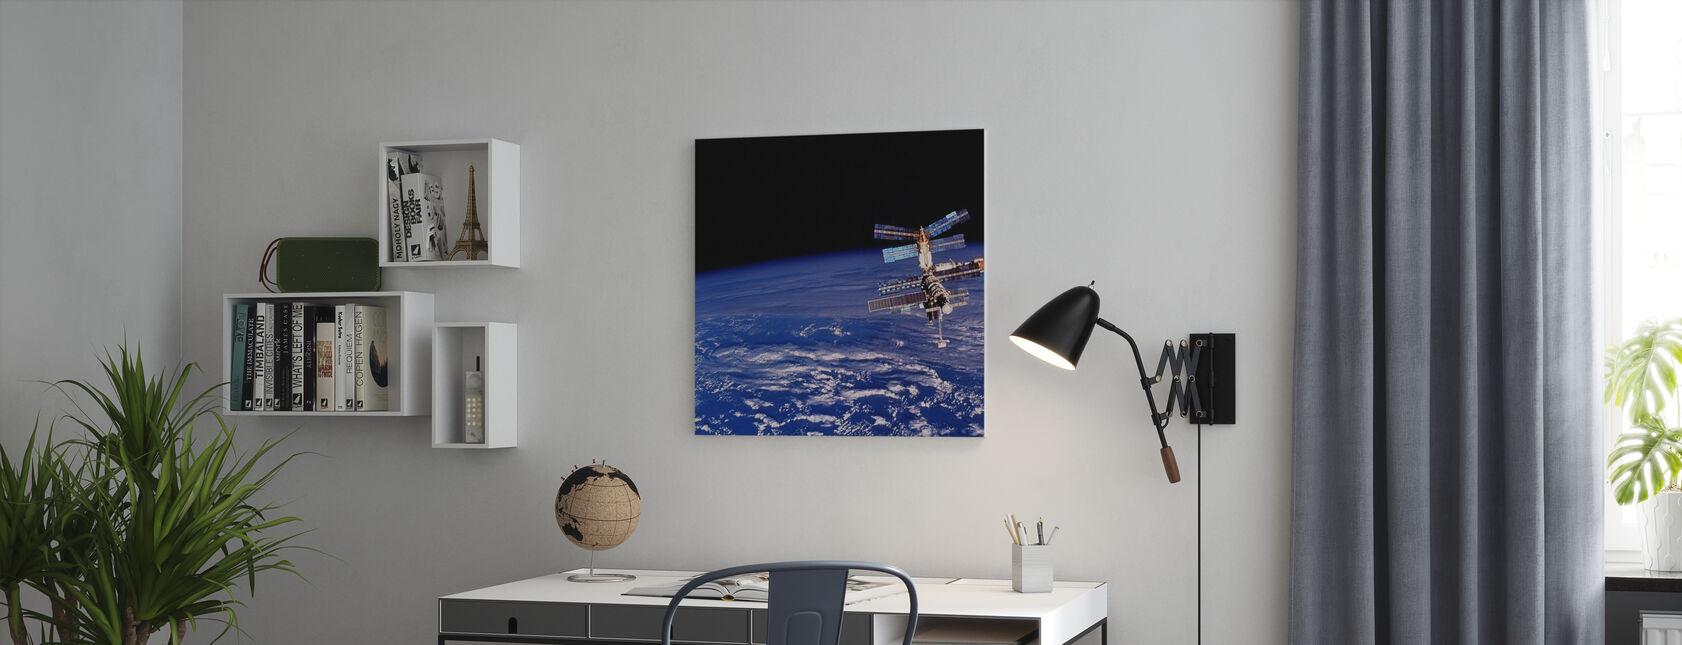 Mir rymdstation - Canvastavla - Kontor